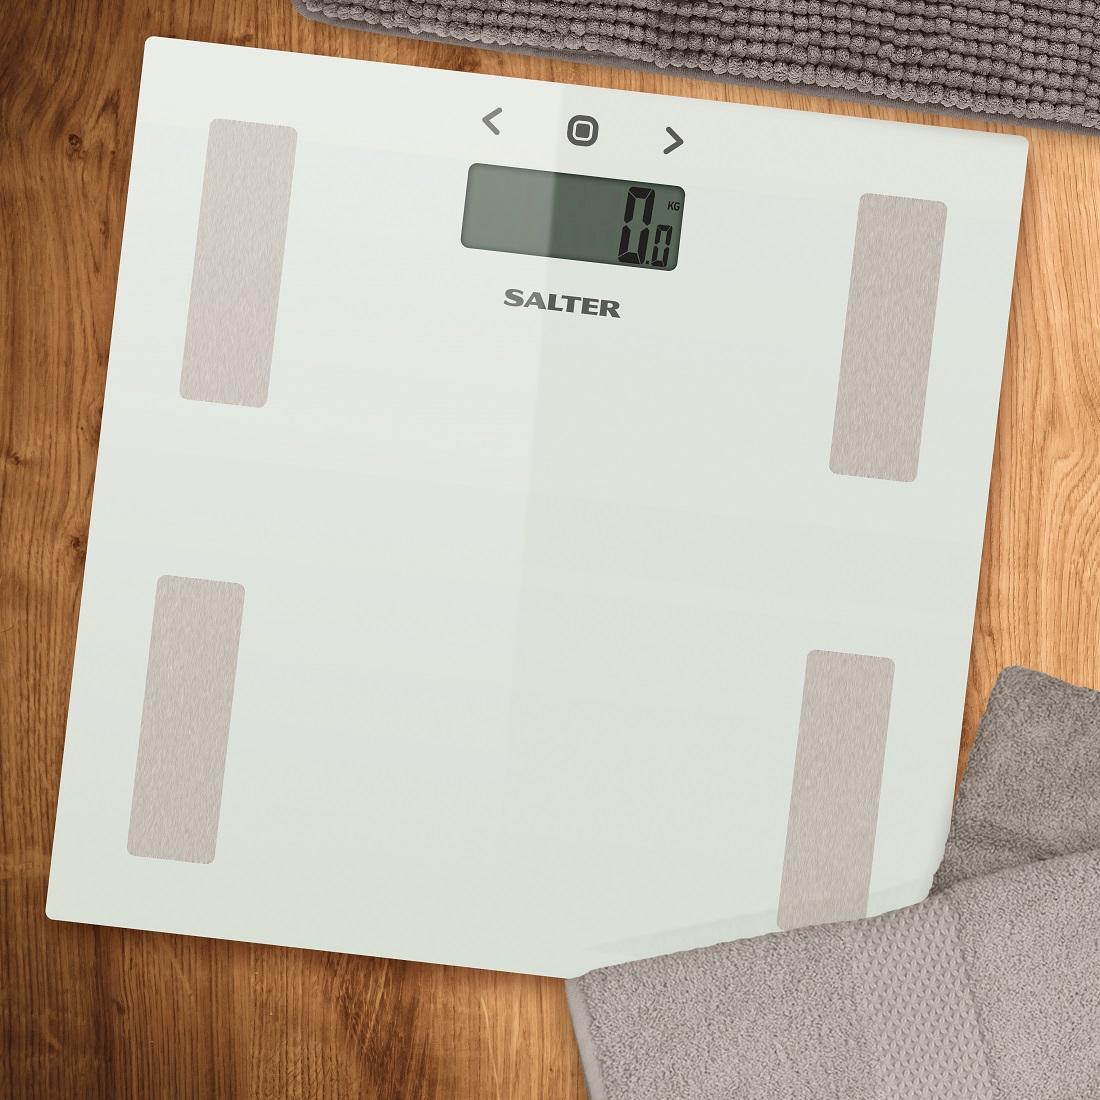 Bmi Bathroom Scale: Salter Digital Bathroom Scale